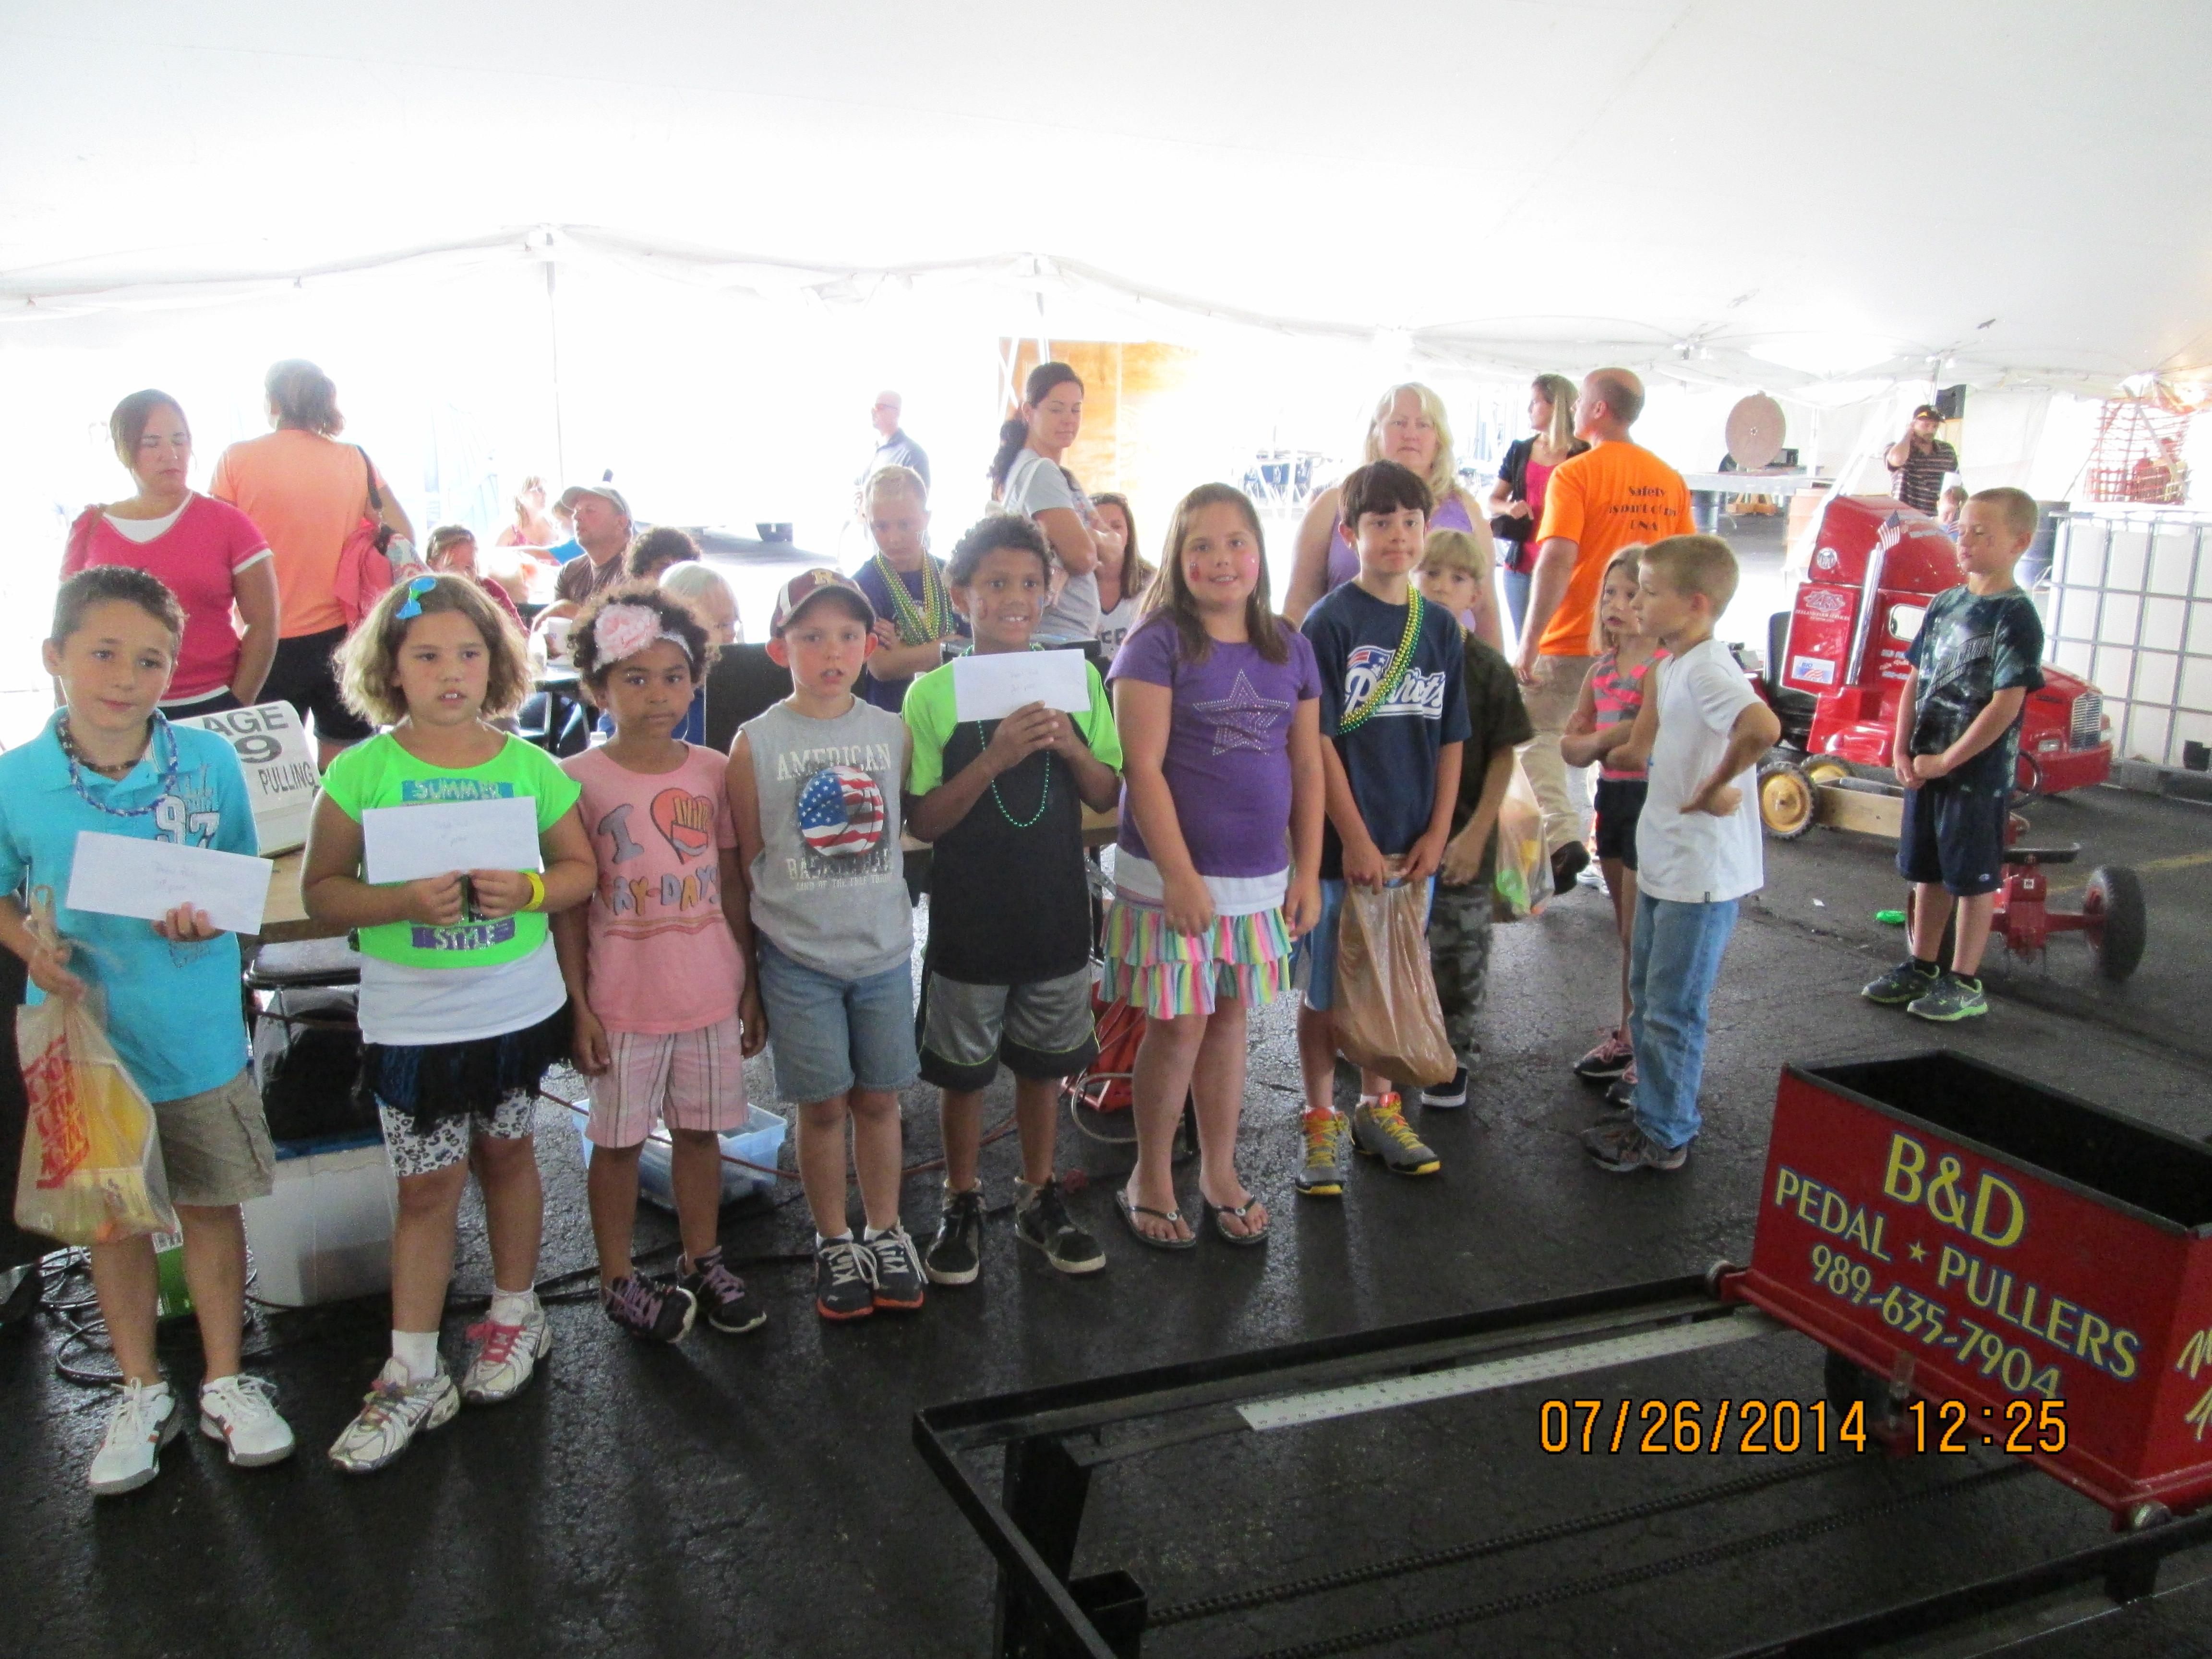 Munger Potato Festival  MUNGER POTATO FESTIVAL JULY 26 2014